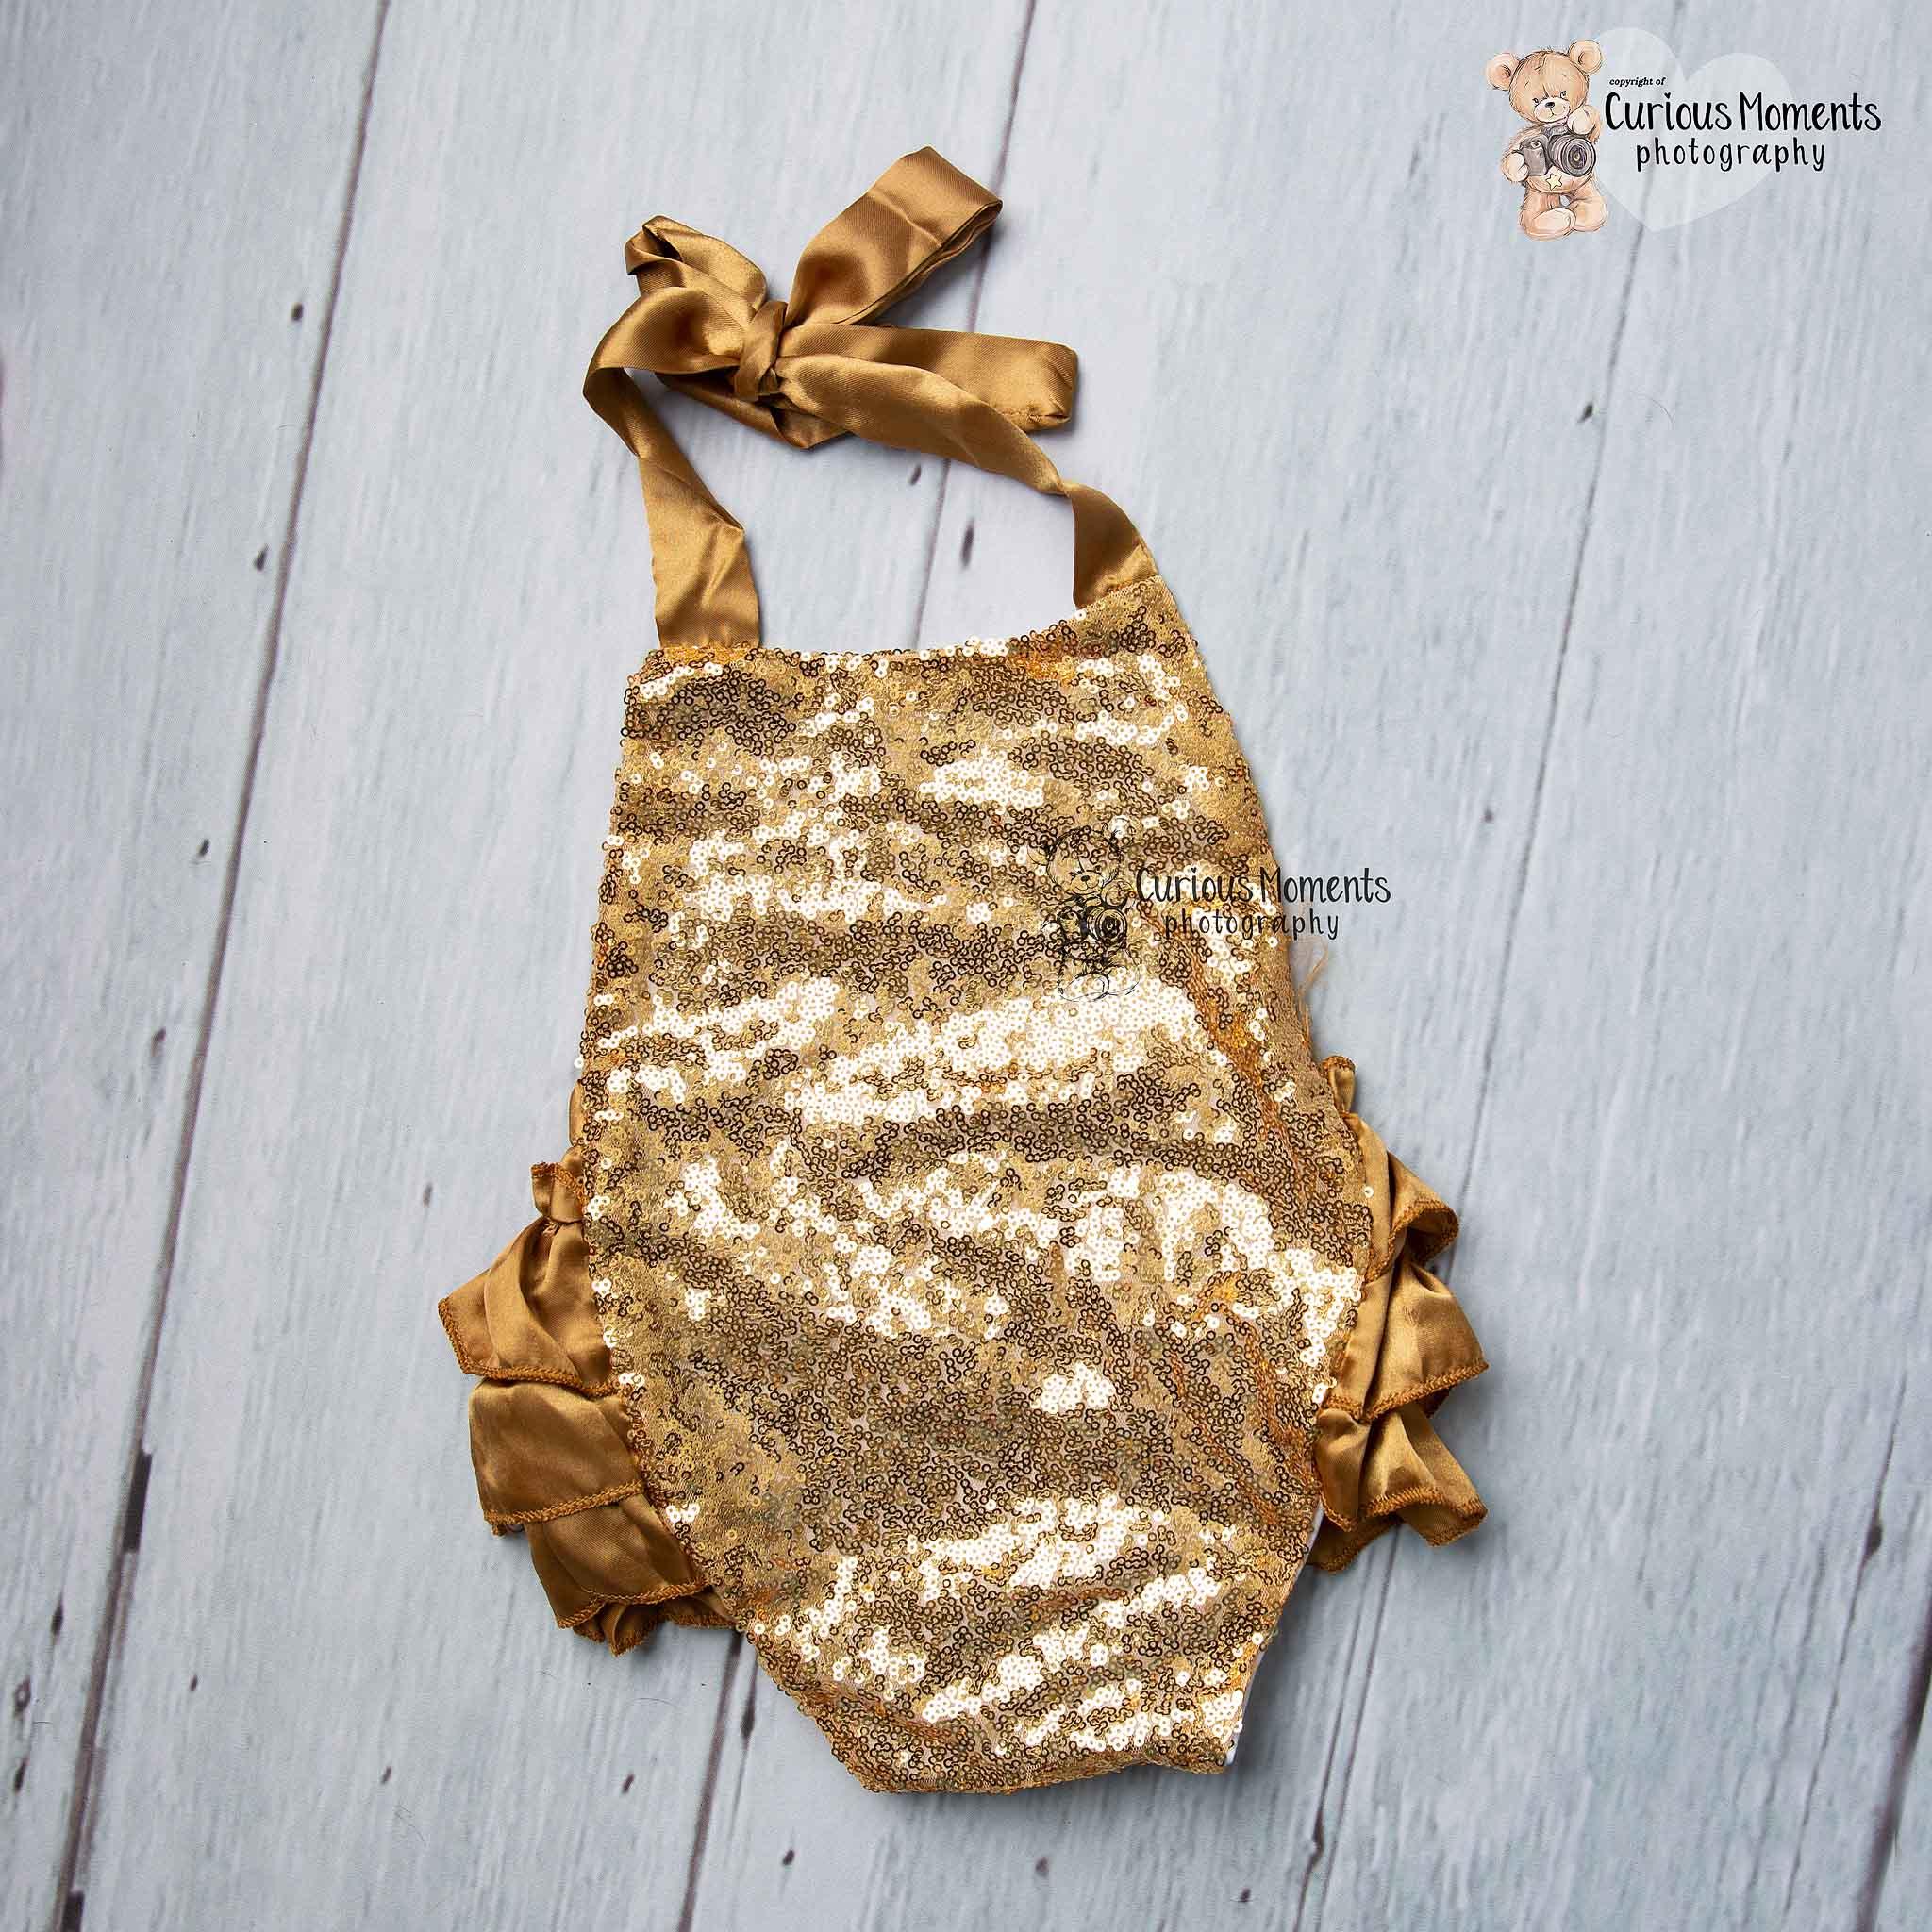 Gold sequin romper for ckae smash whitland